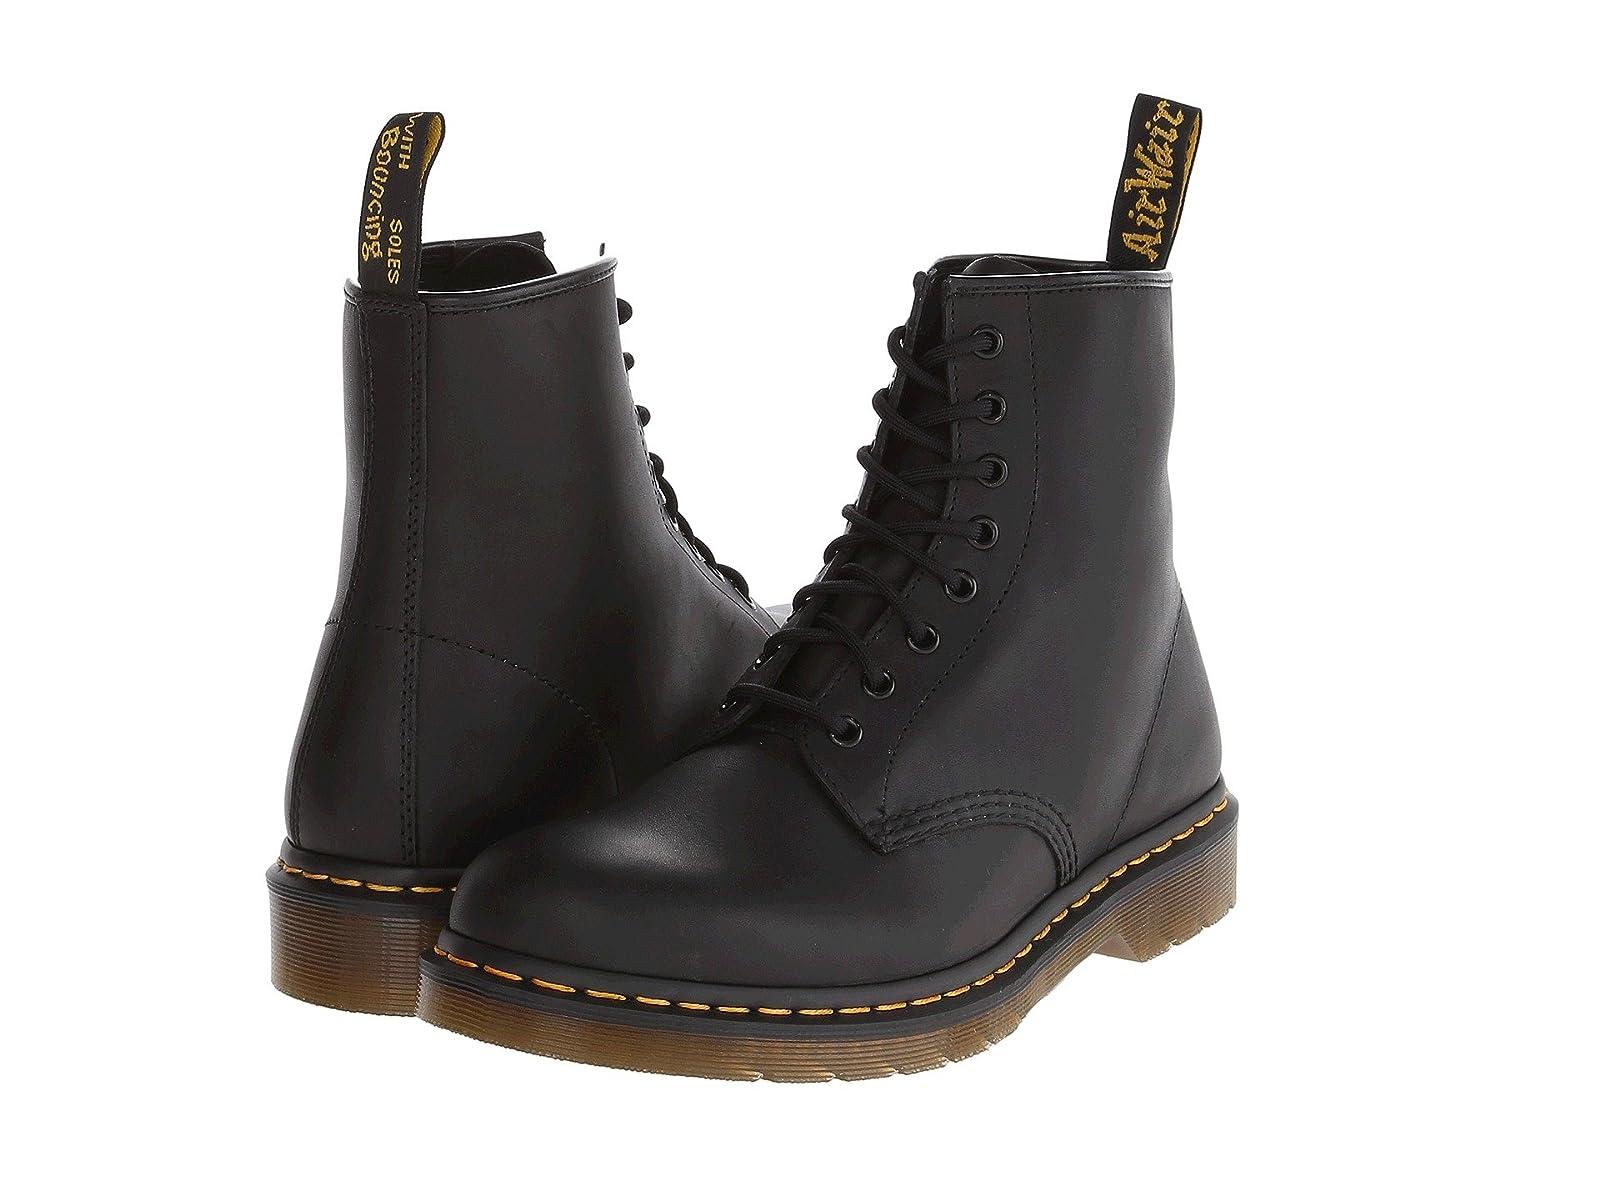 Dr. Martens 1460Affordable and distinctive shoes